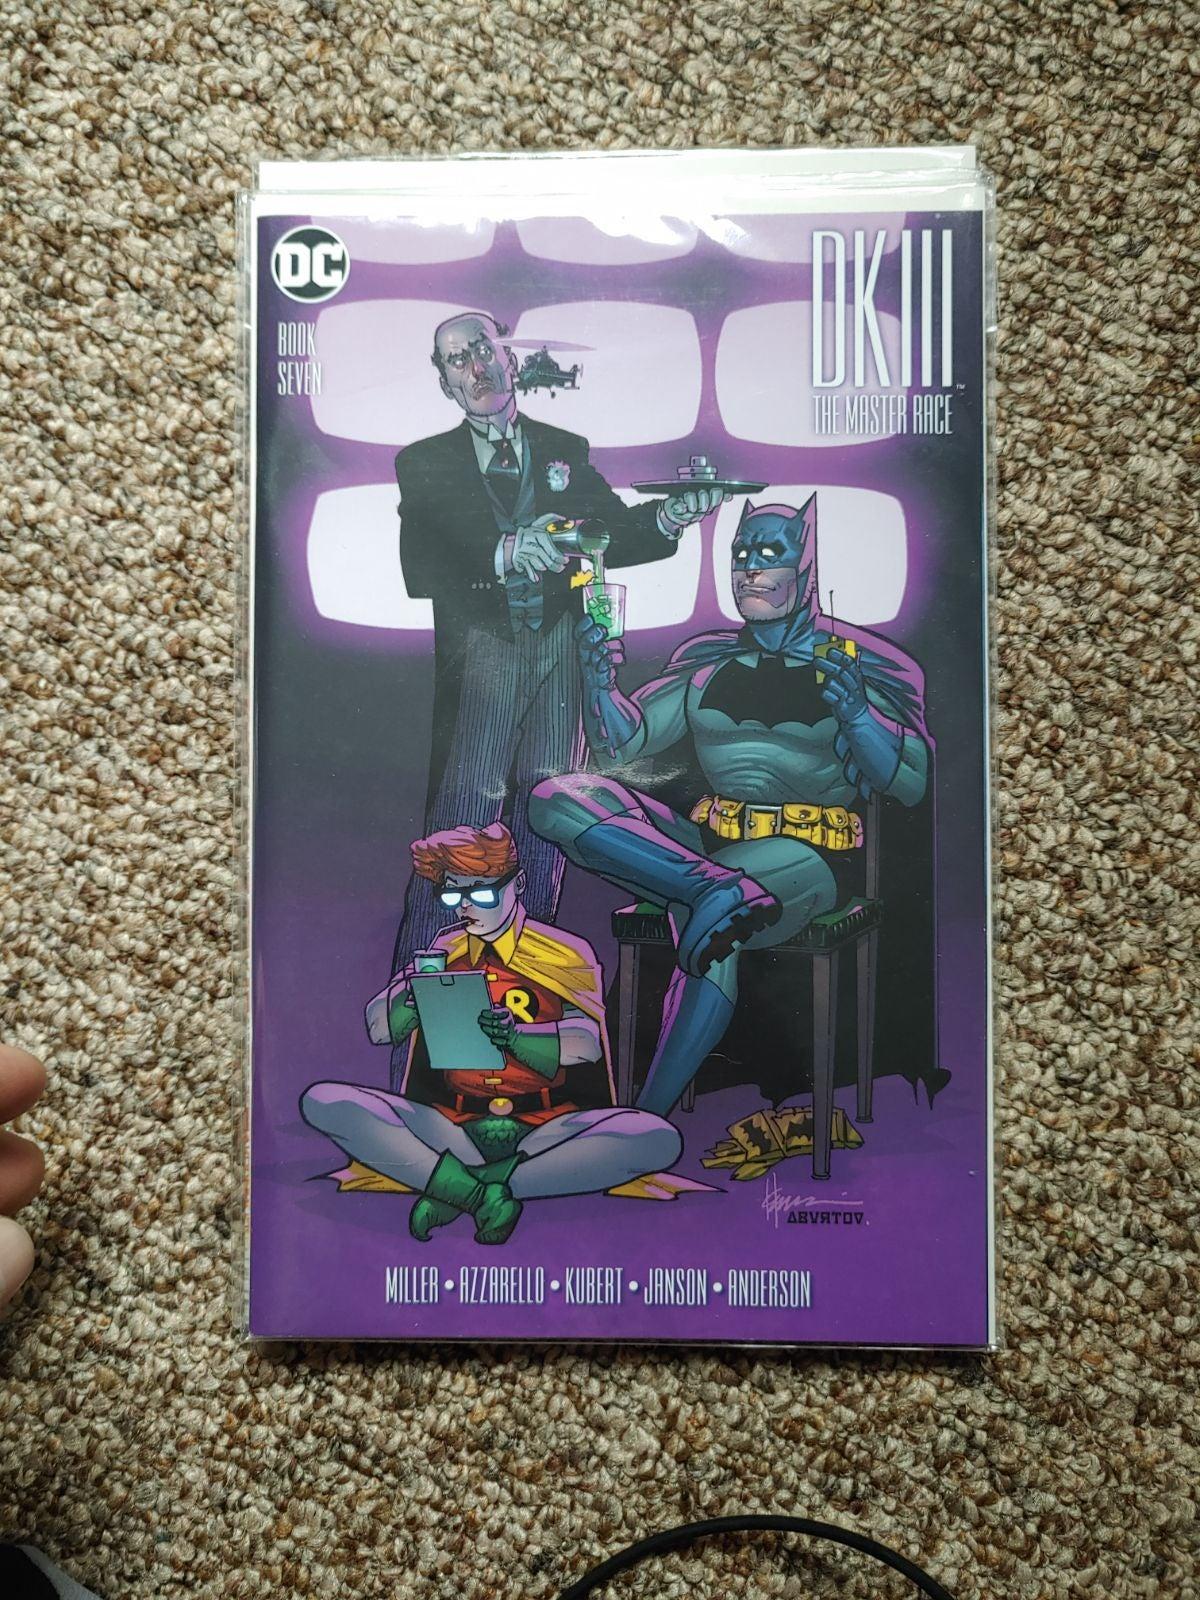 The Dark Knight: The Master Race book7